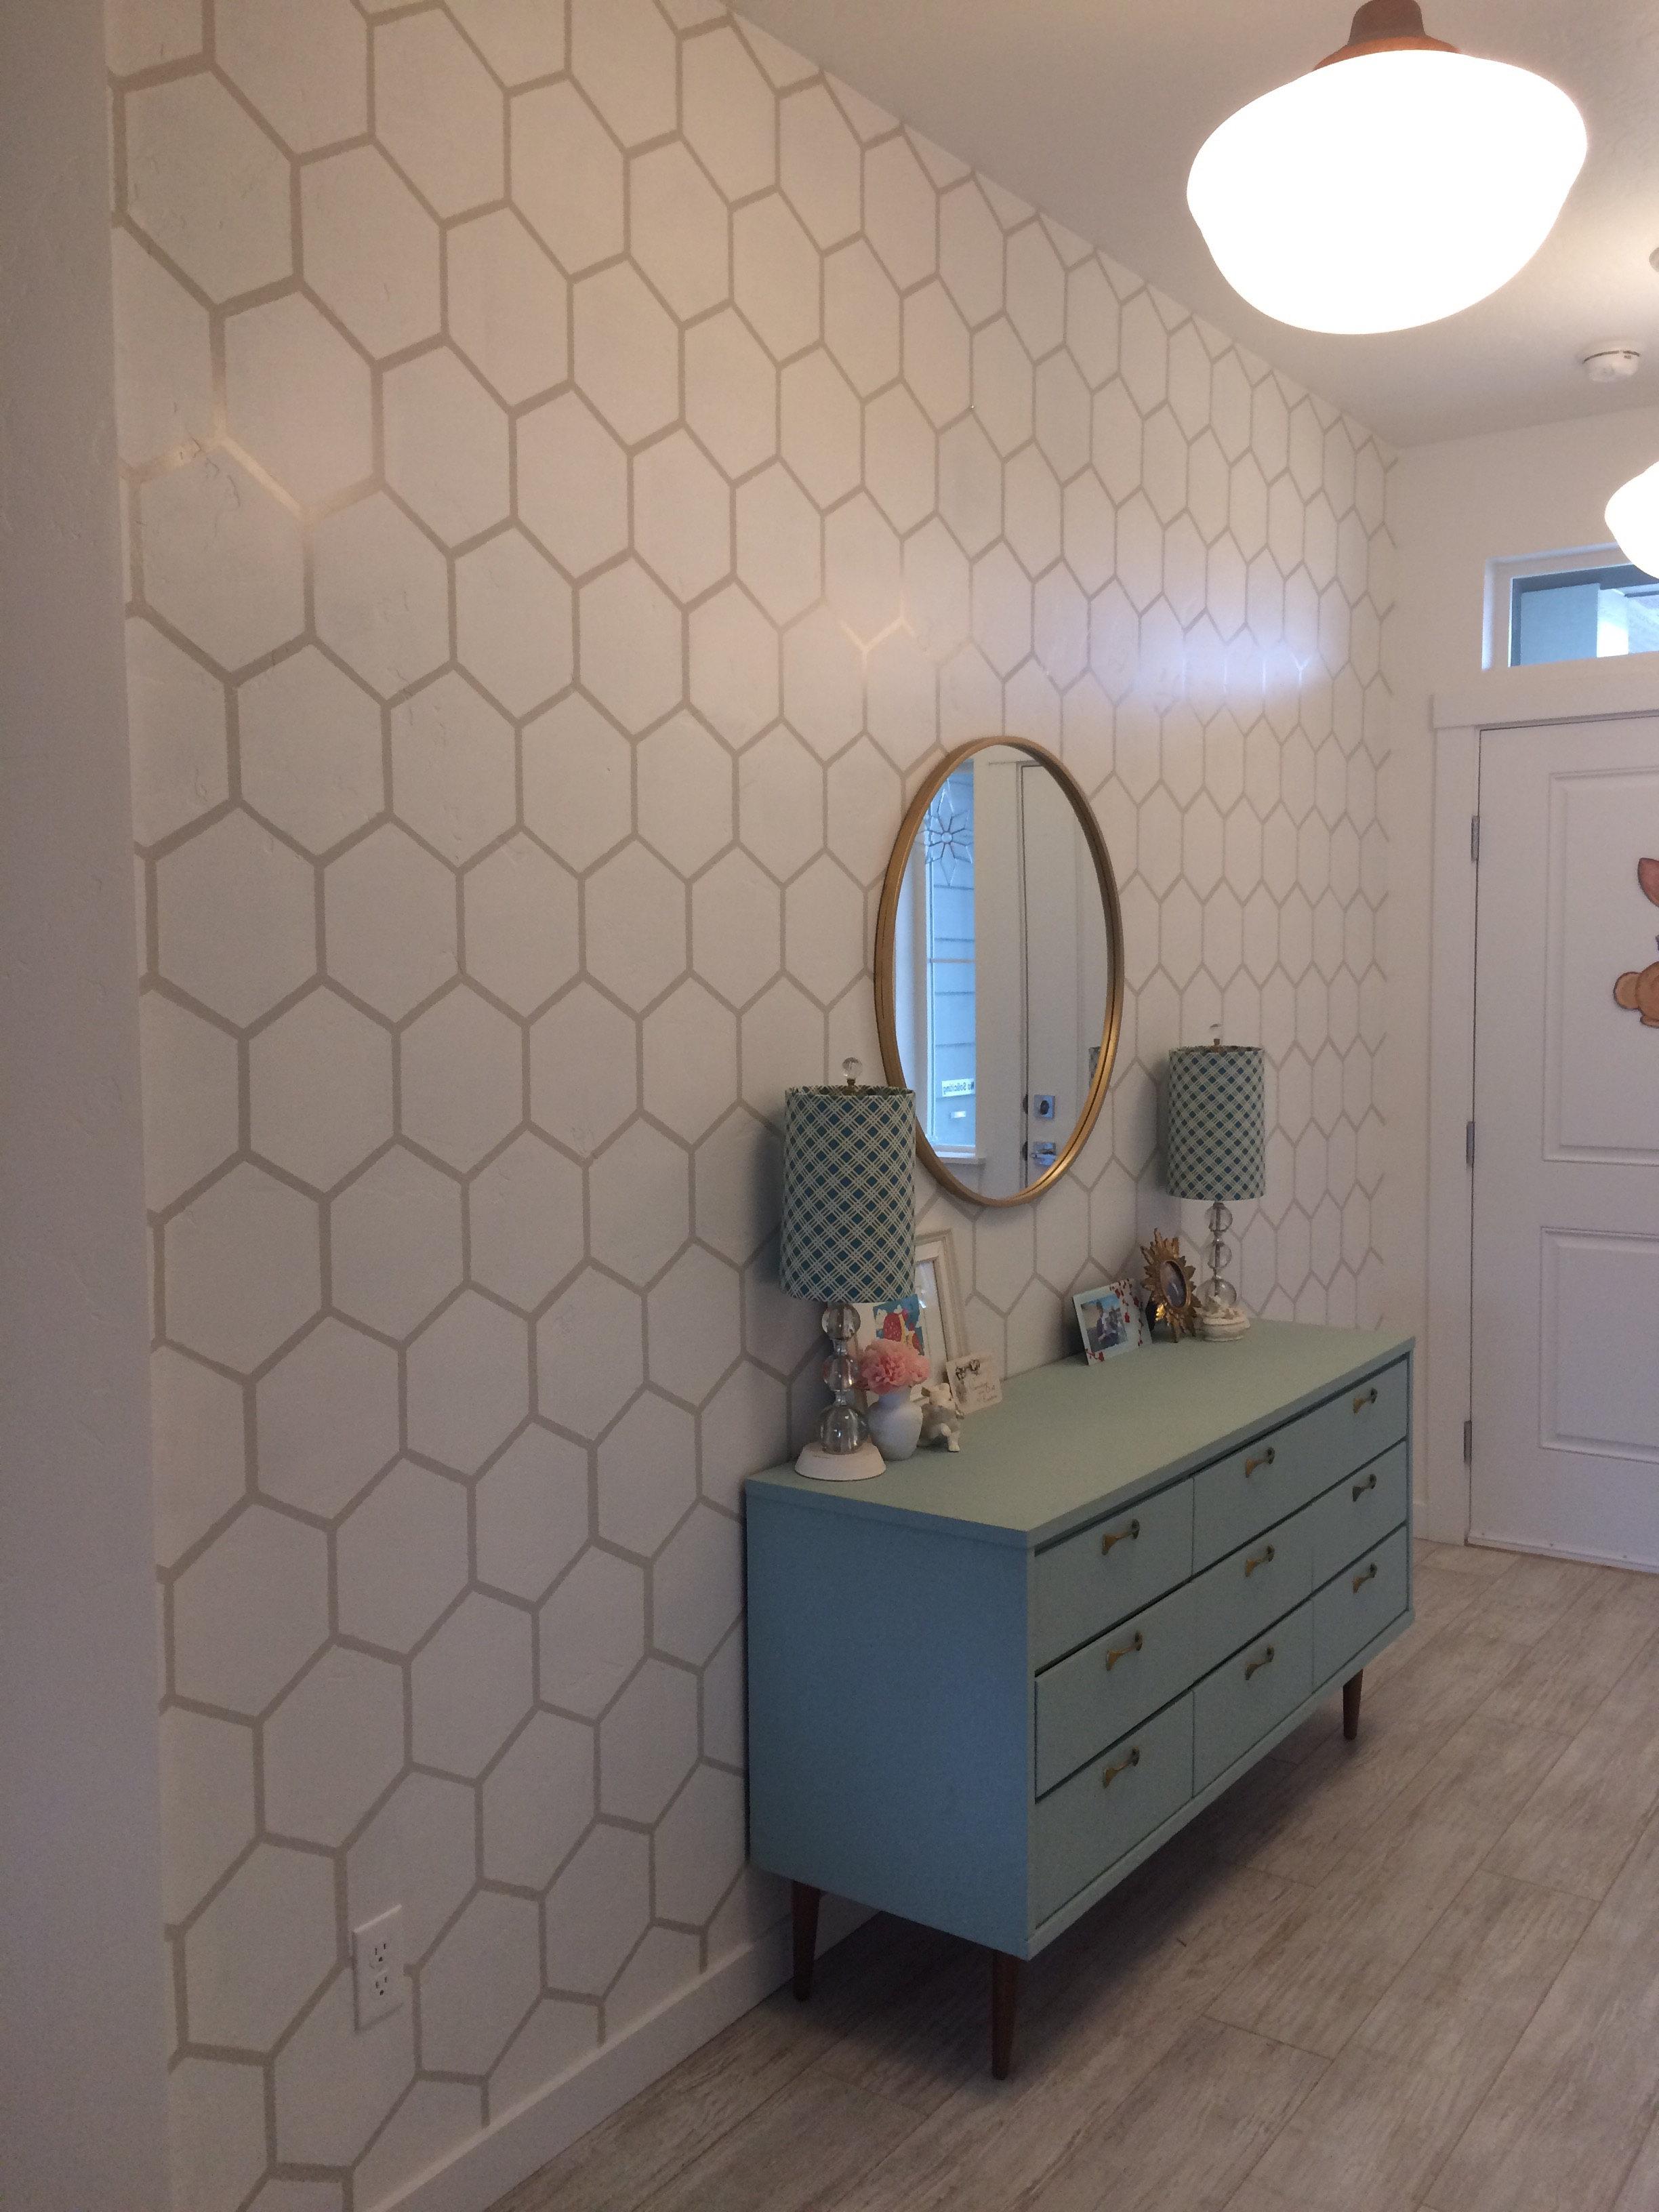 Honeycomb Home Beehive Shoppe.jpg